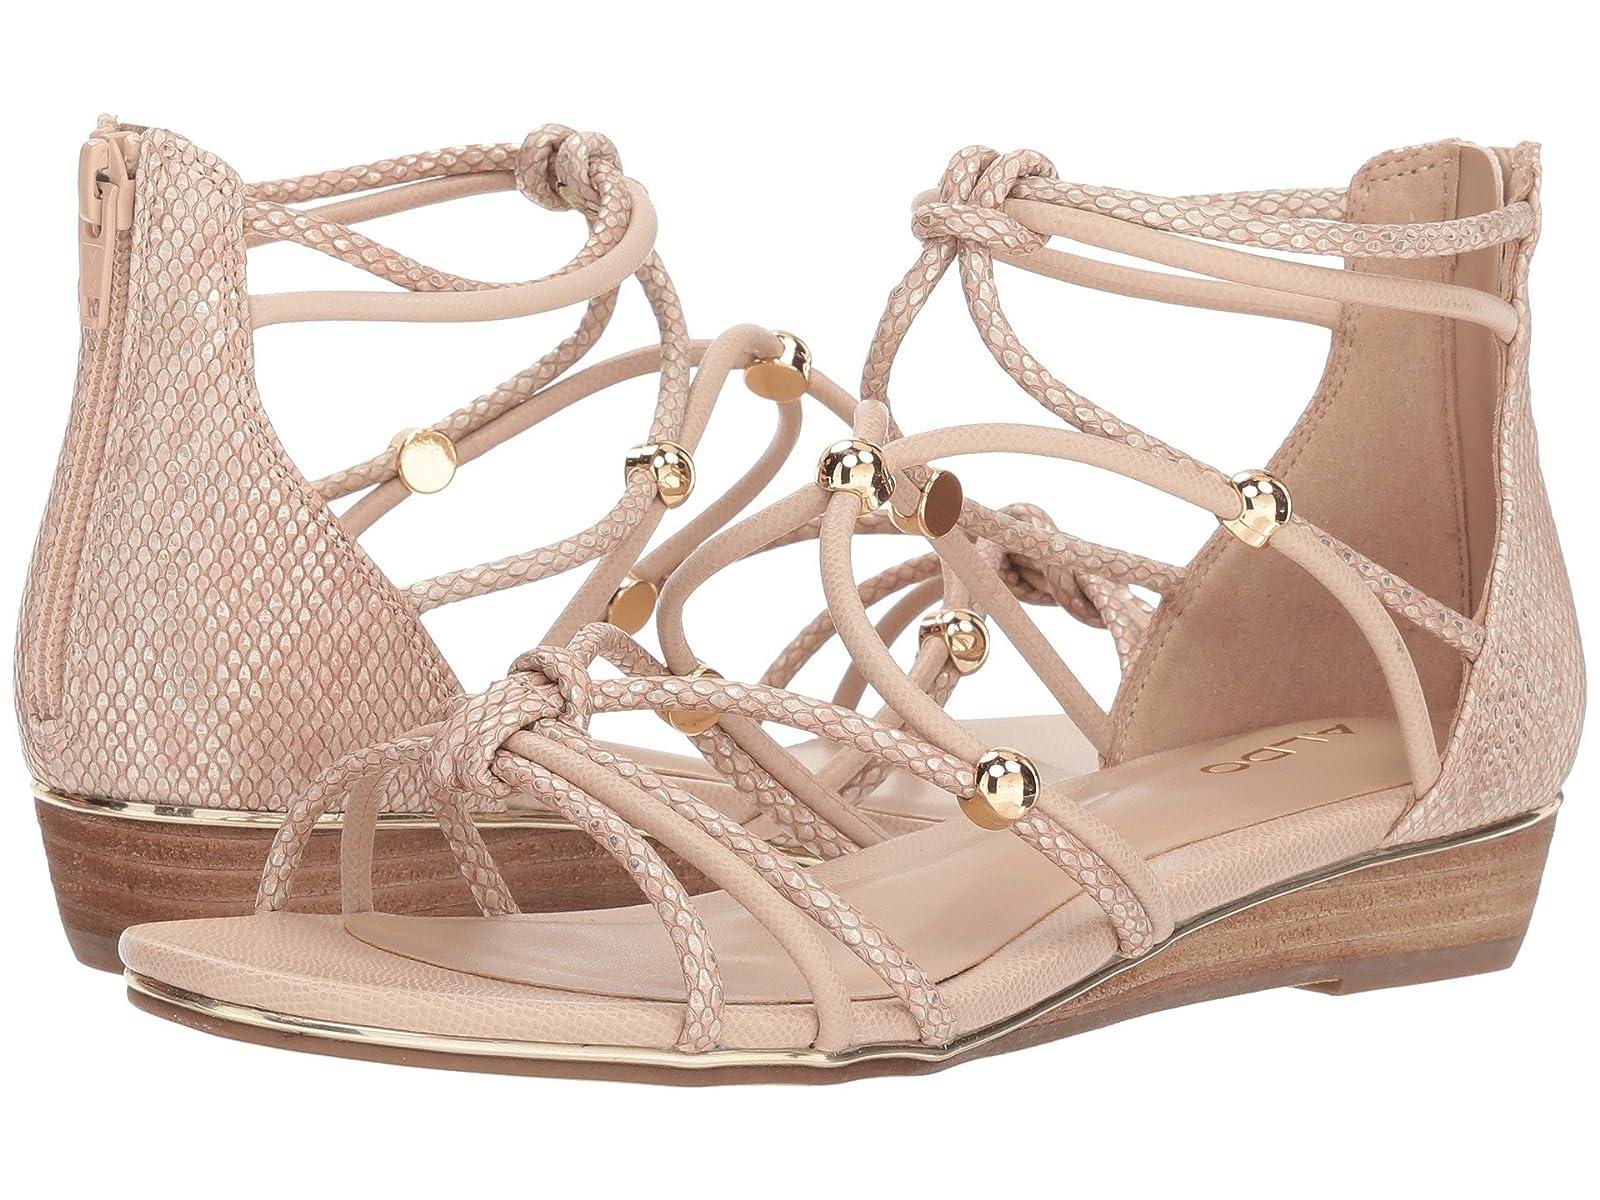 ALDO MurieleCheap and distinctive eye-catching shoes